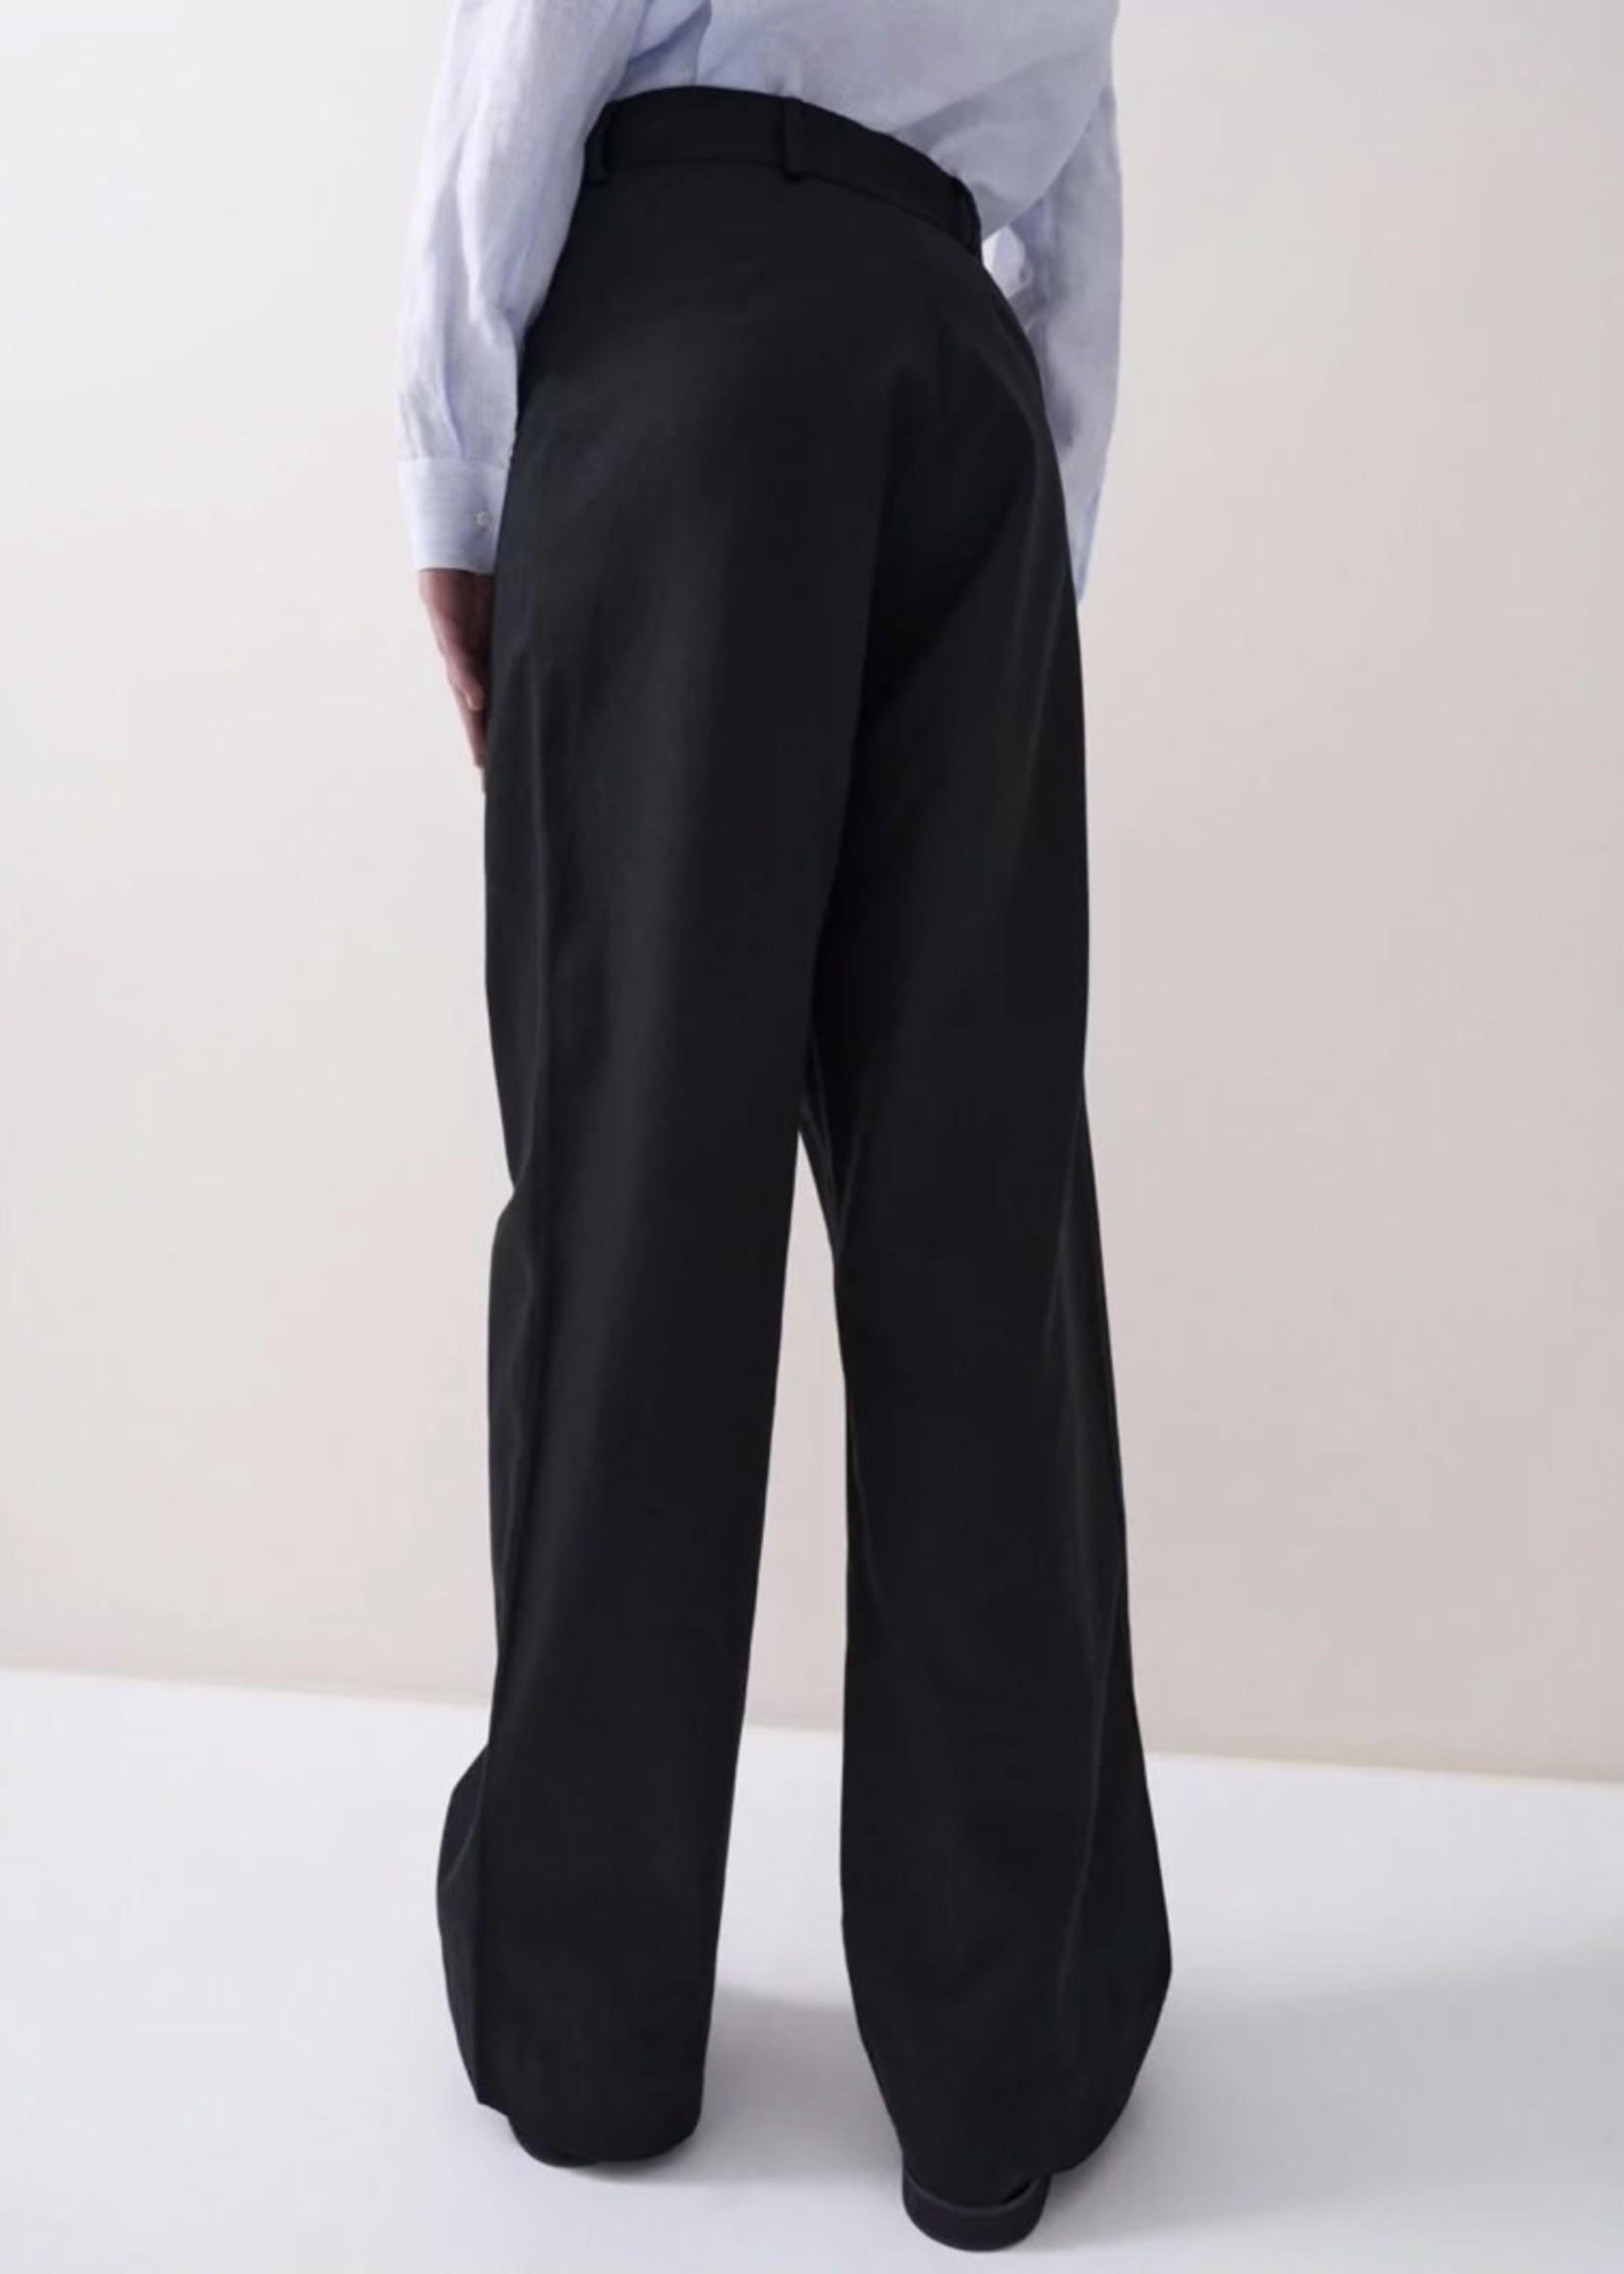 rikastudios rikastudios ulrika pants cotton black